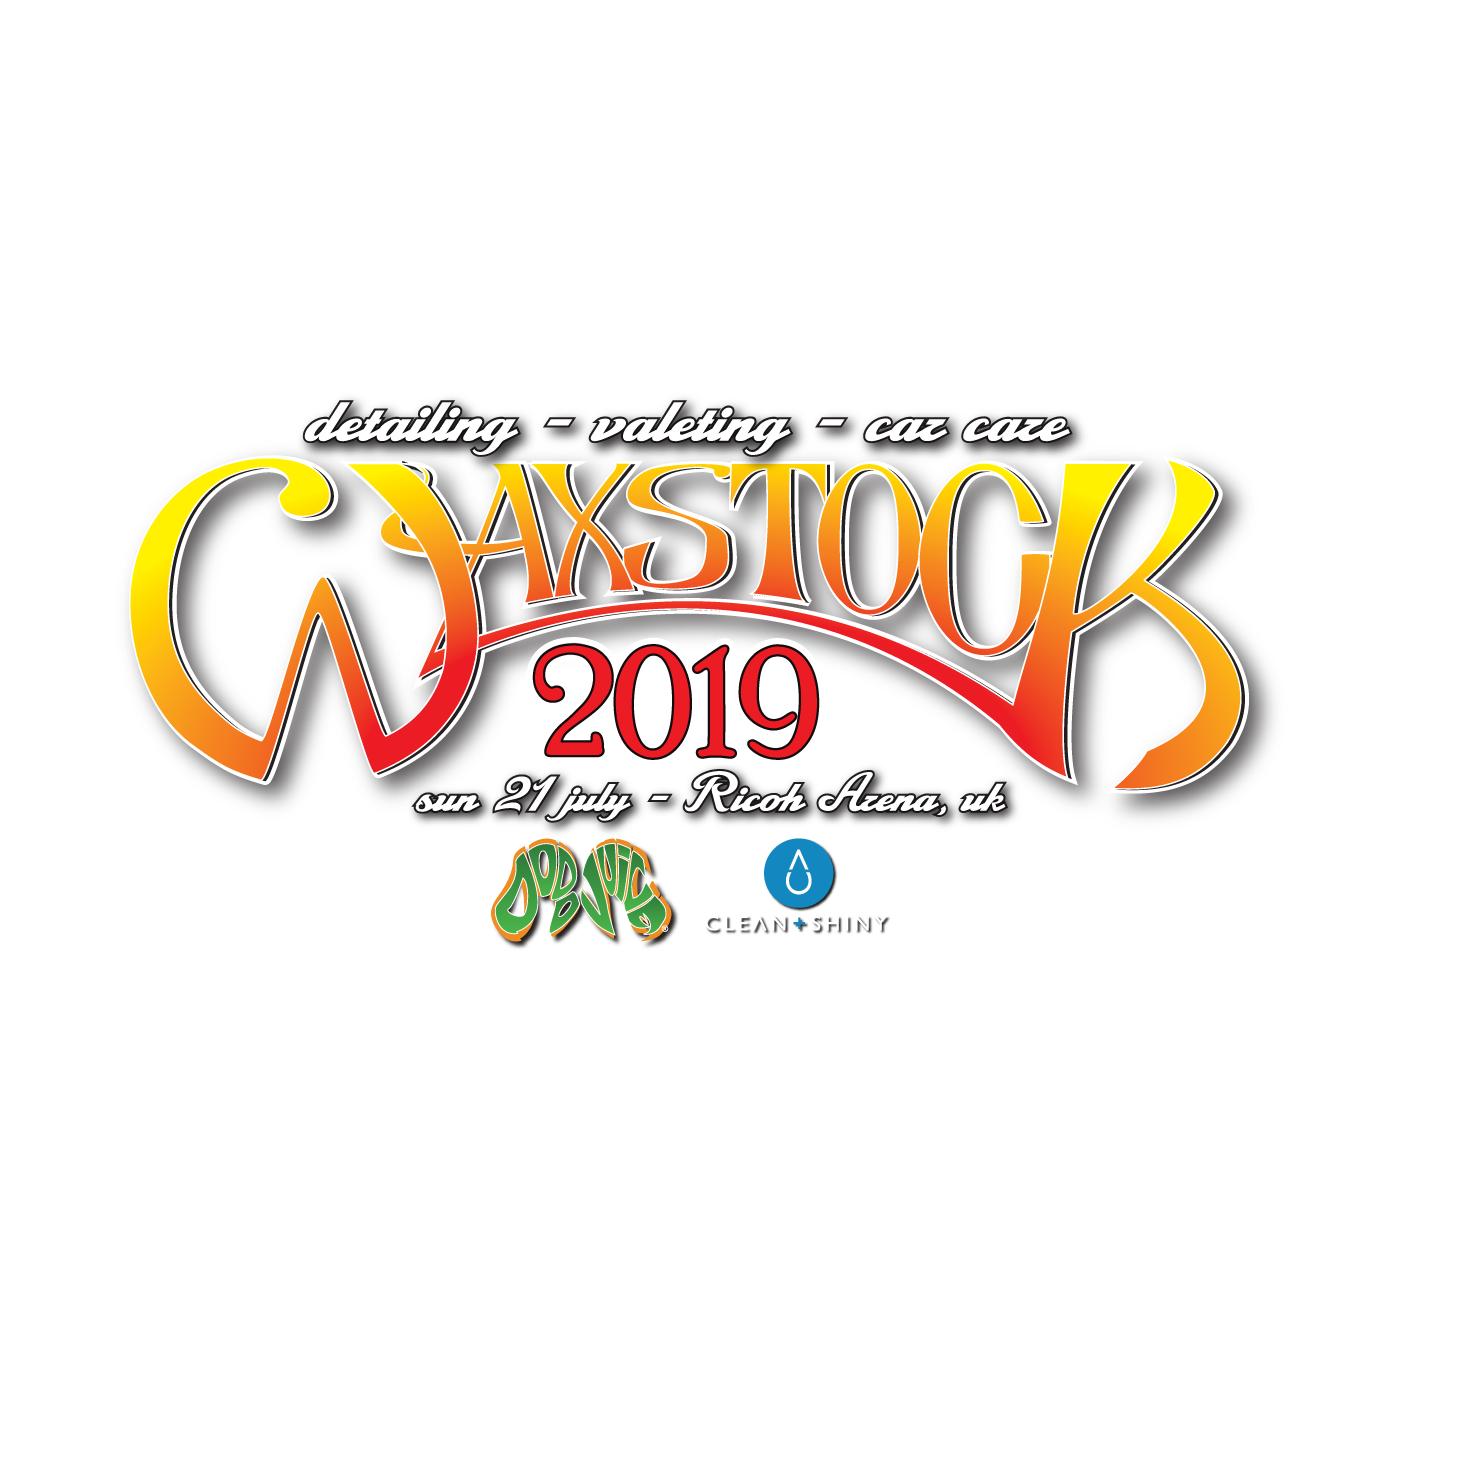 Waxstock Logo